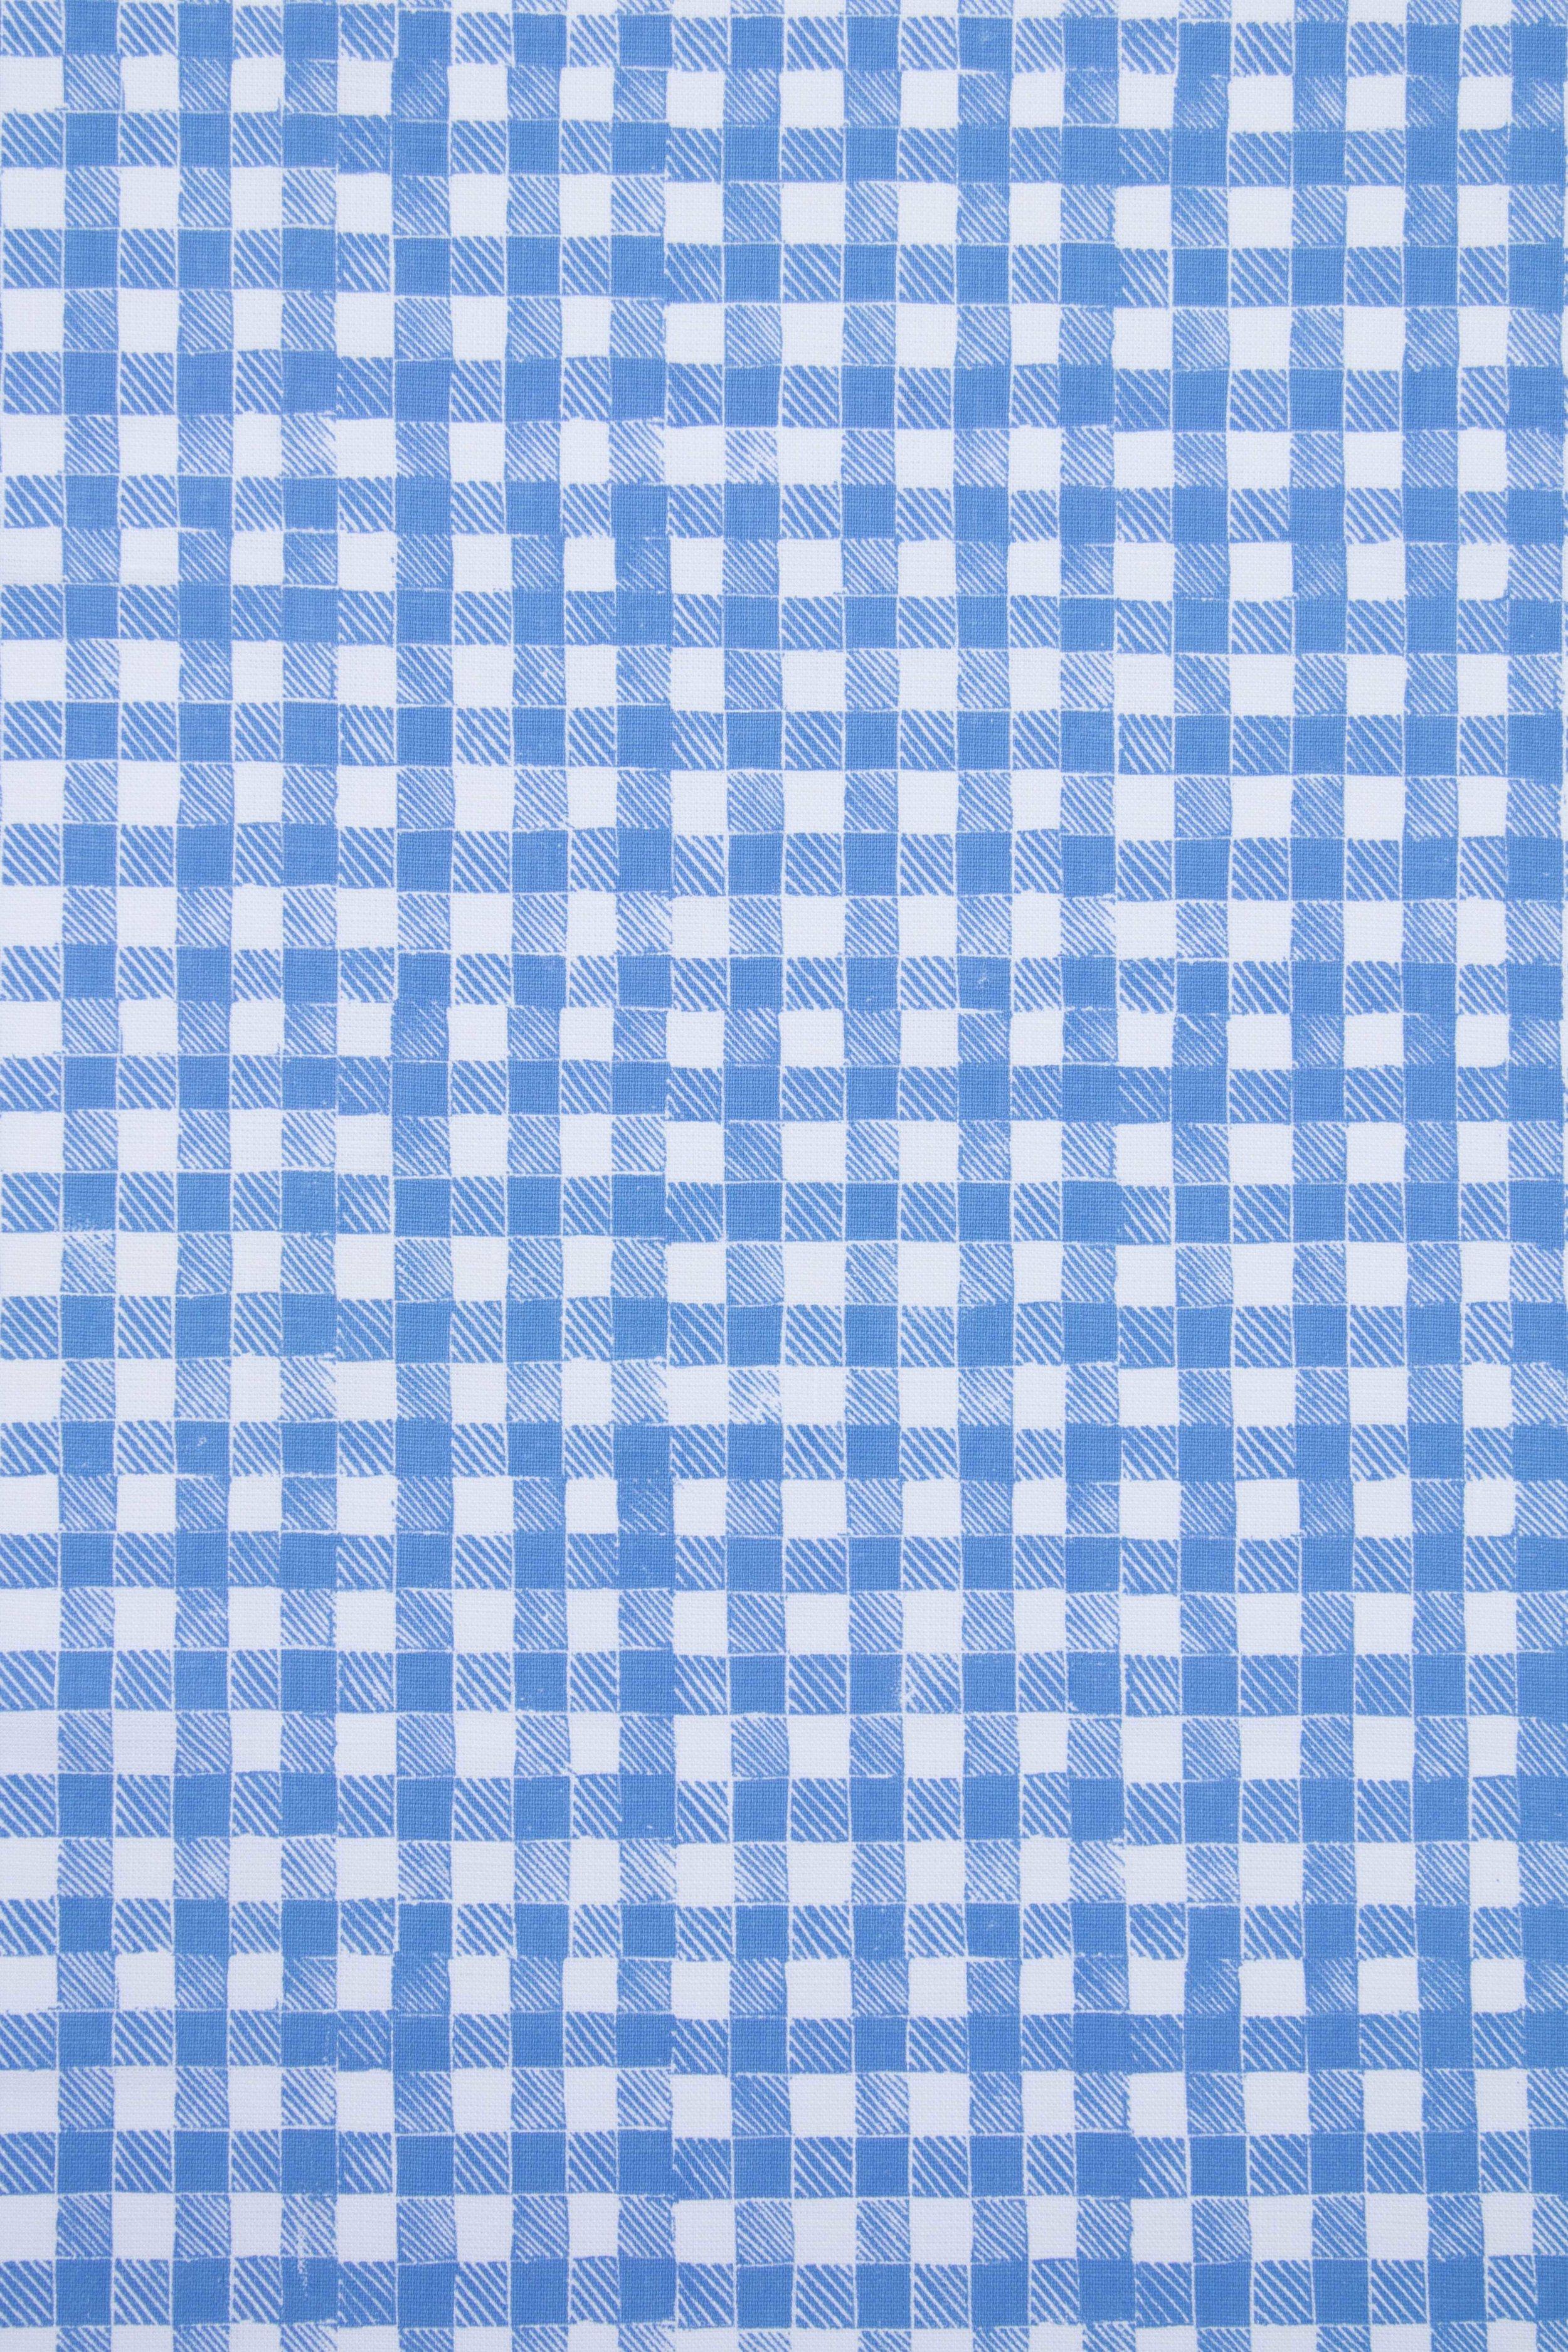 Block Print Gingham in Blue, KF250-01